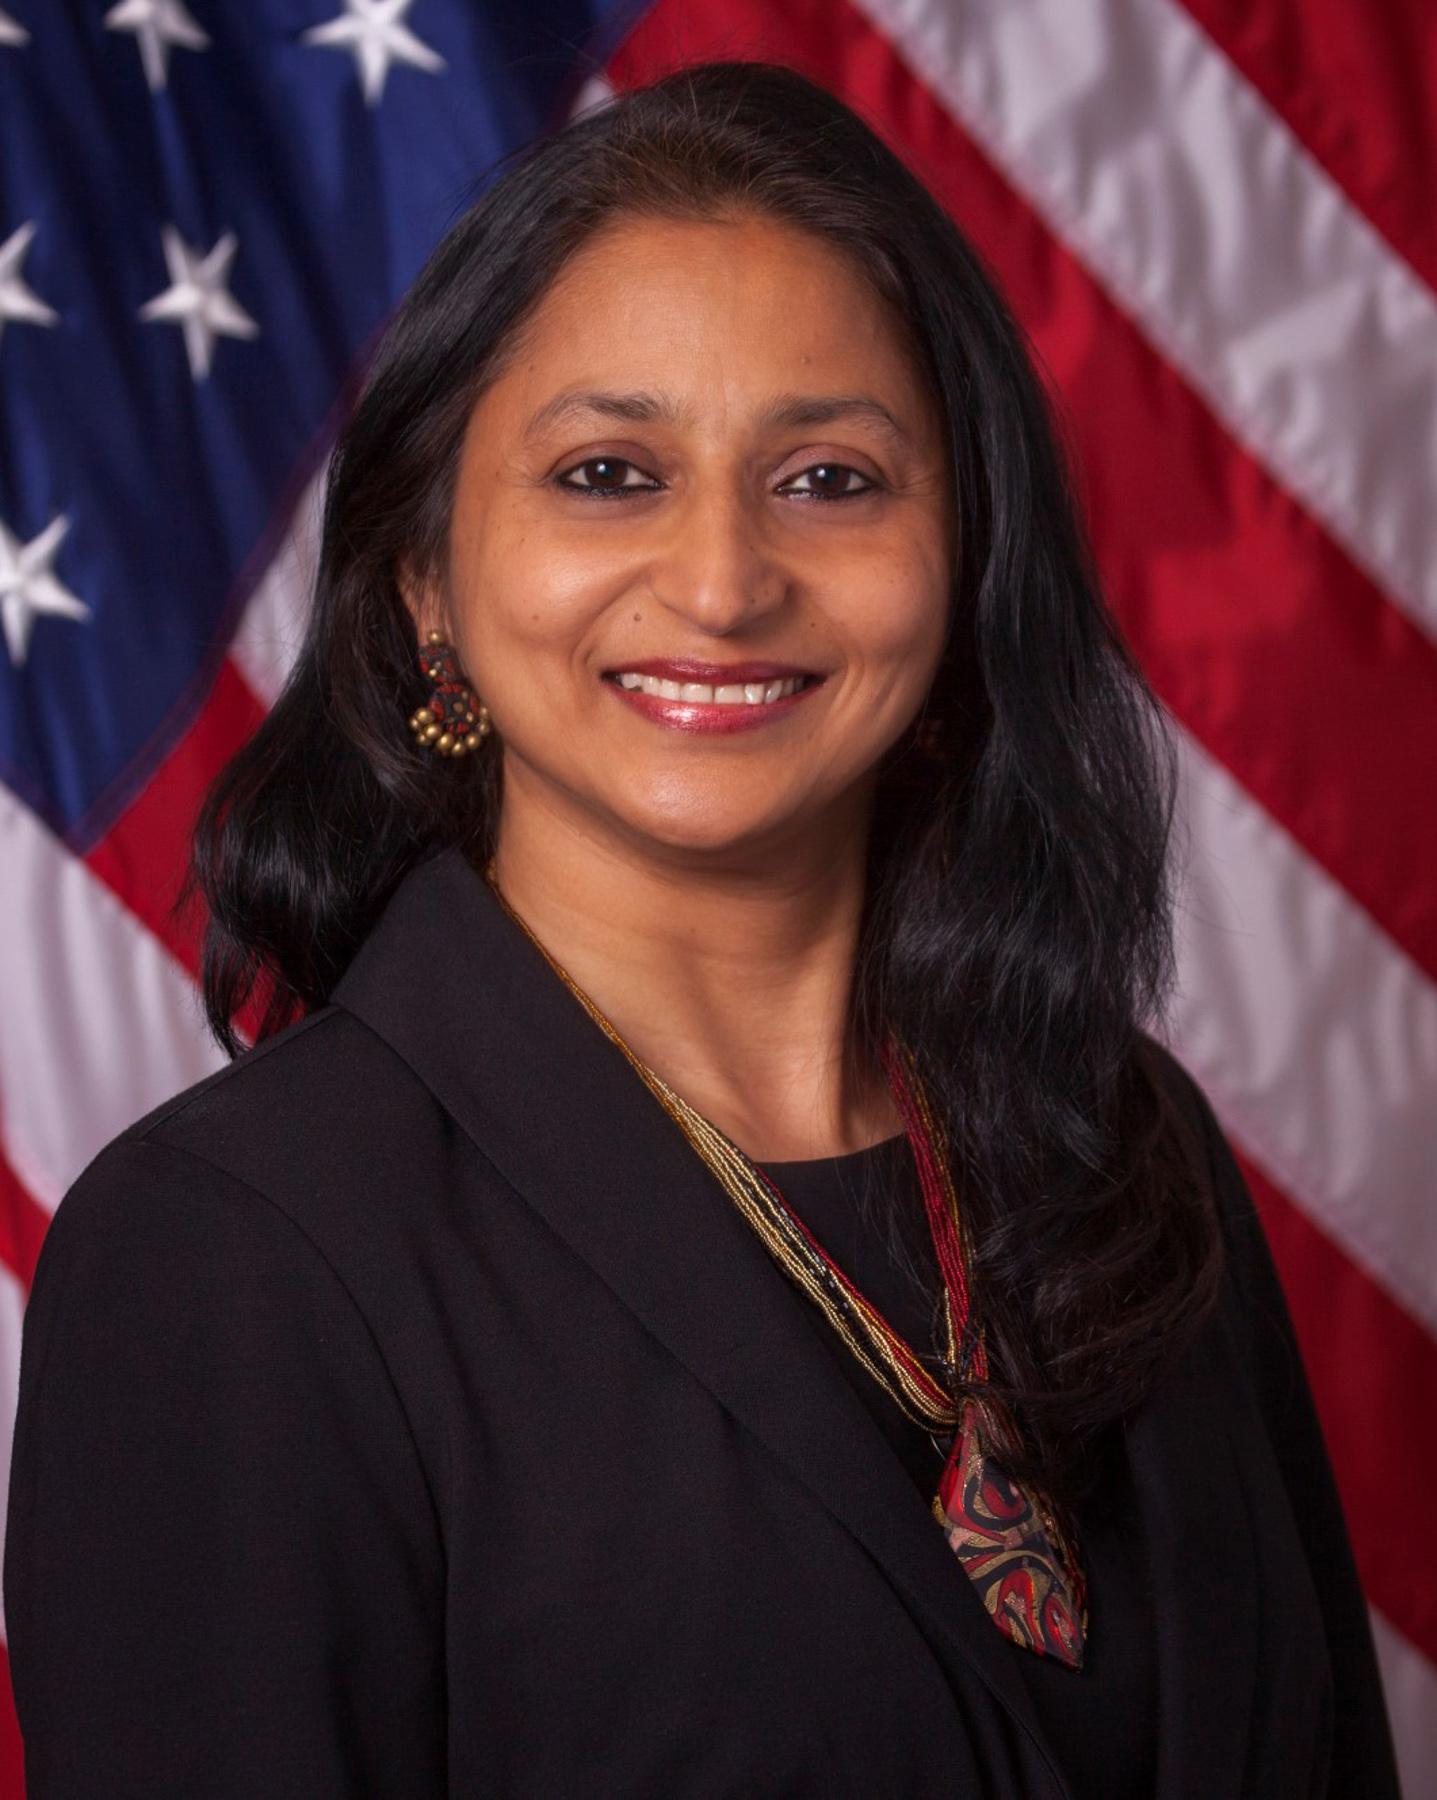 Portrait photo of Savita Vaidhyanathan (© AP Images)